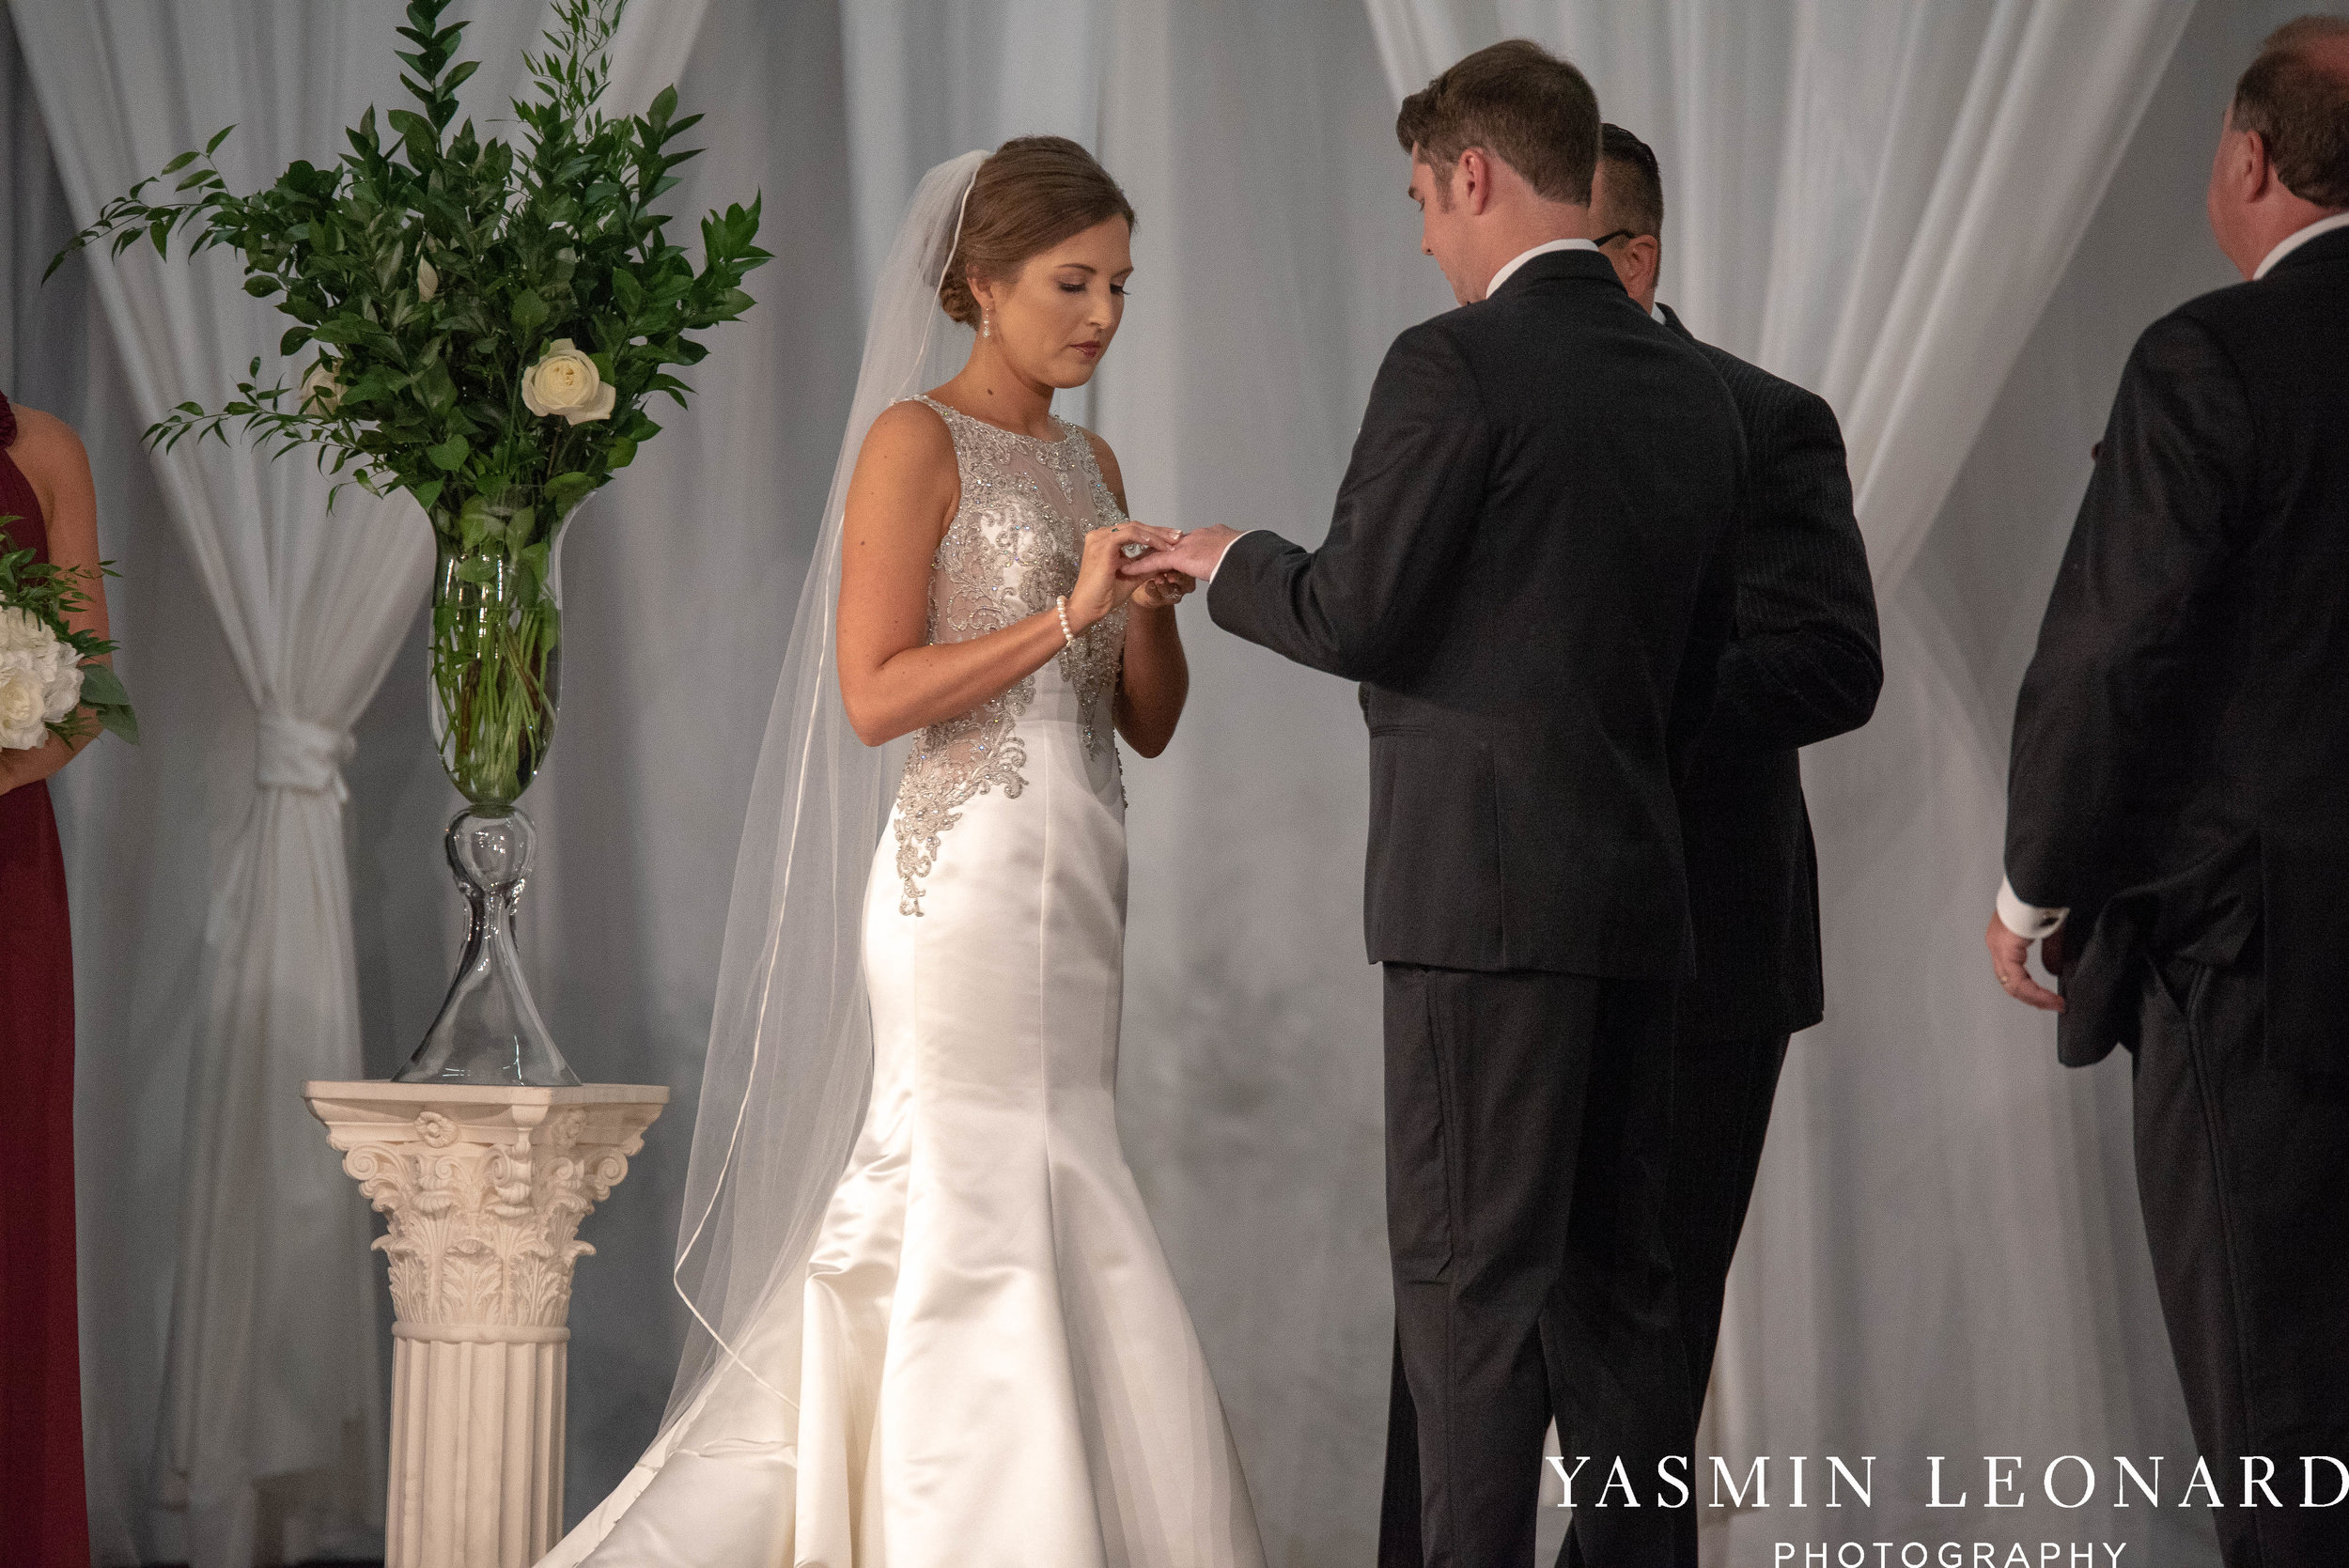 Millennium Center Wedding - Downtown Winston Salem - Winston Salem Wedding Photographer - Winston Salem Venues - Indoor Wedding Venues - NC Wedding Photographer - Yasmin Leonard Photography-40.jpg